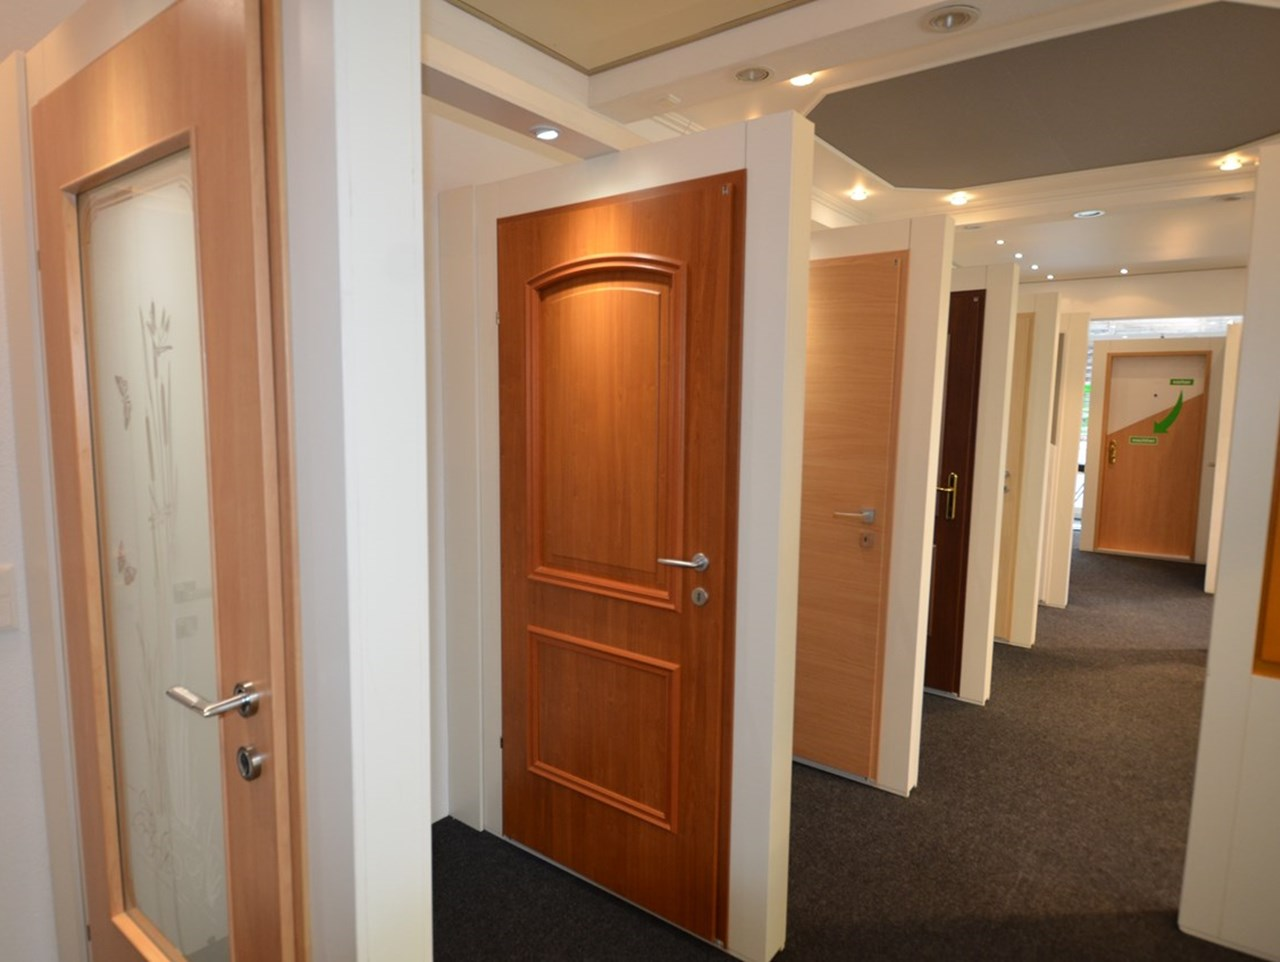 galerie portas partner f haslwanter t ren service gmbh m nchen. Black Bedroom Furniture Sets. Home Design Ideas